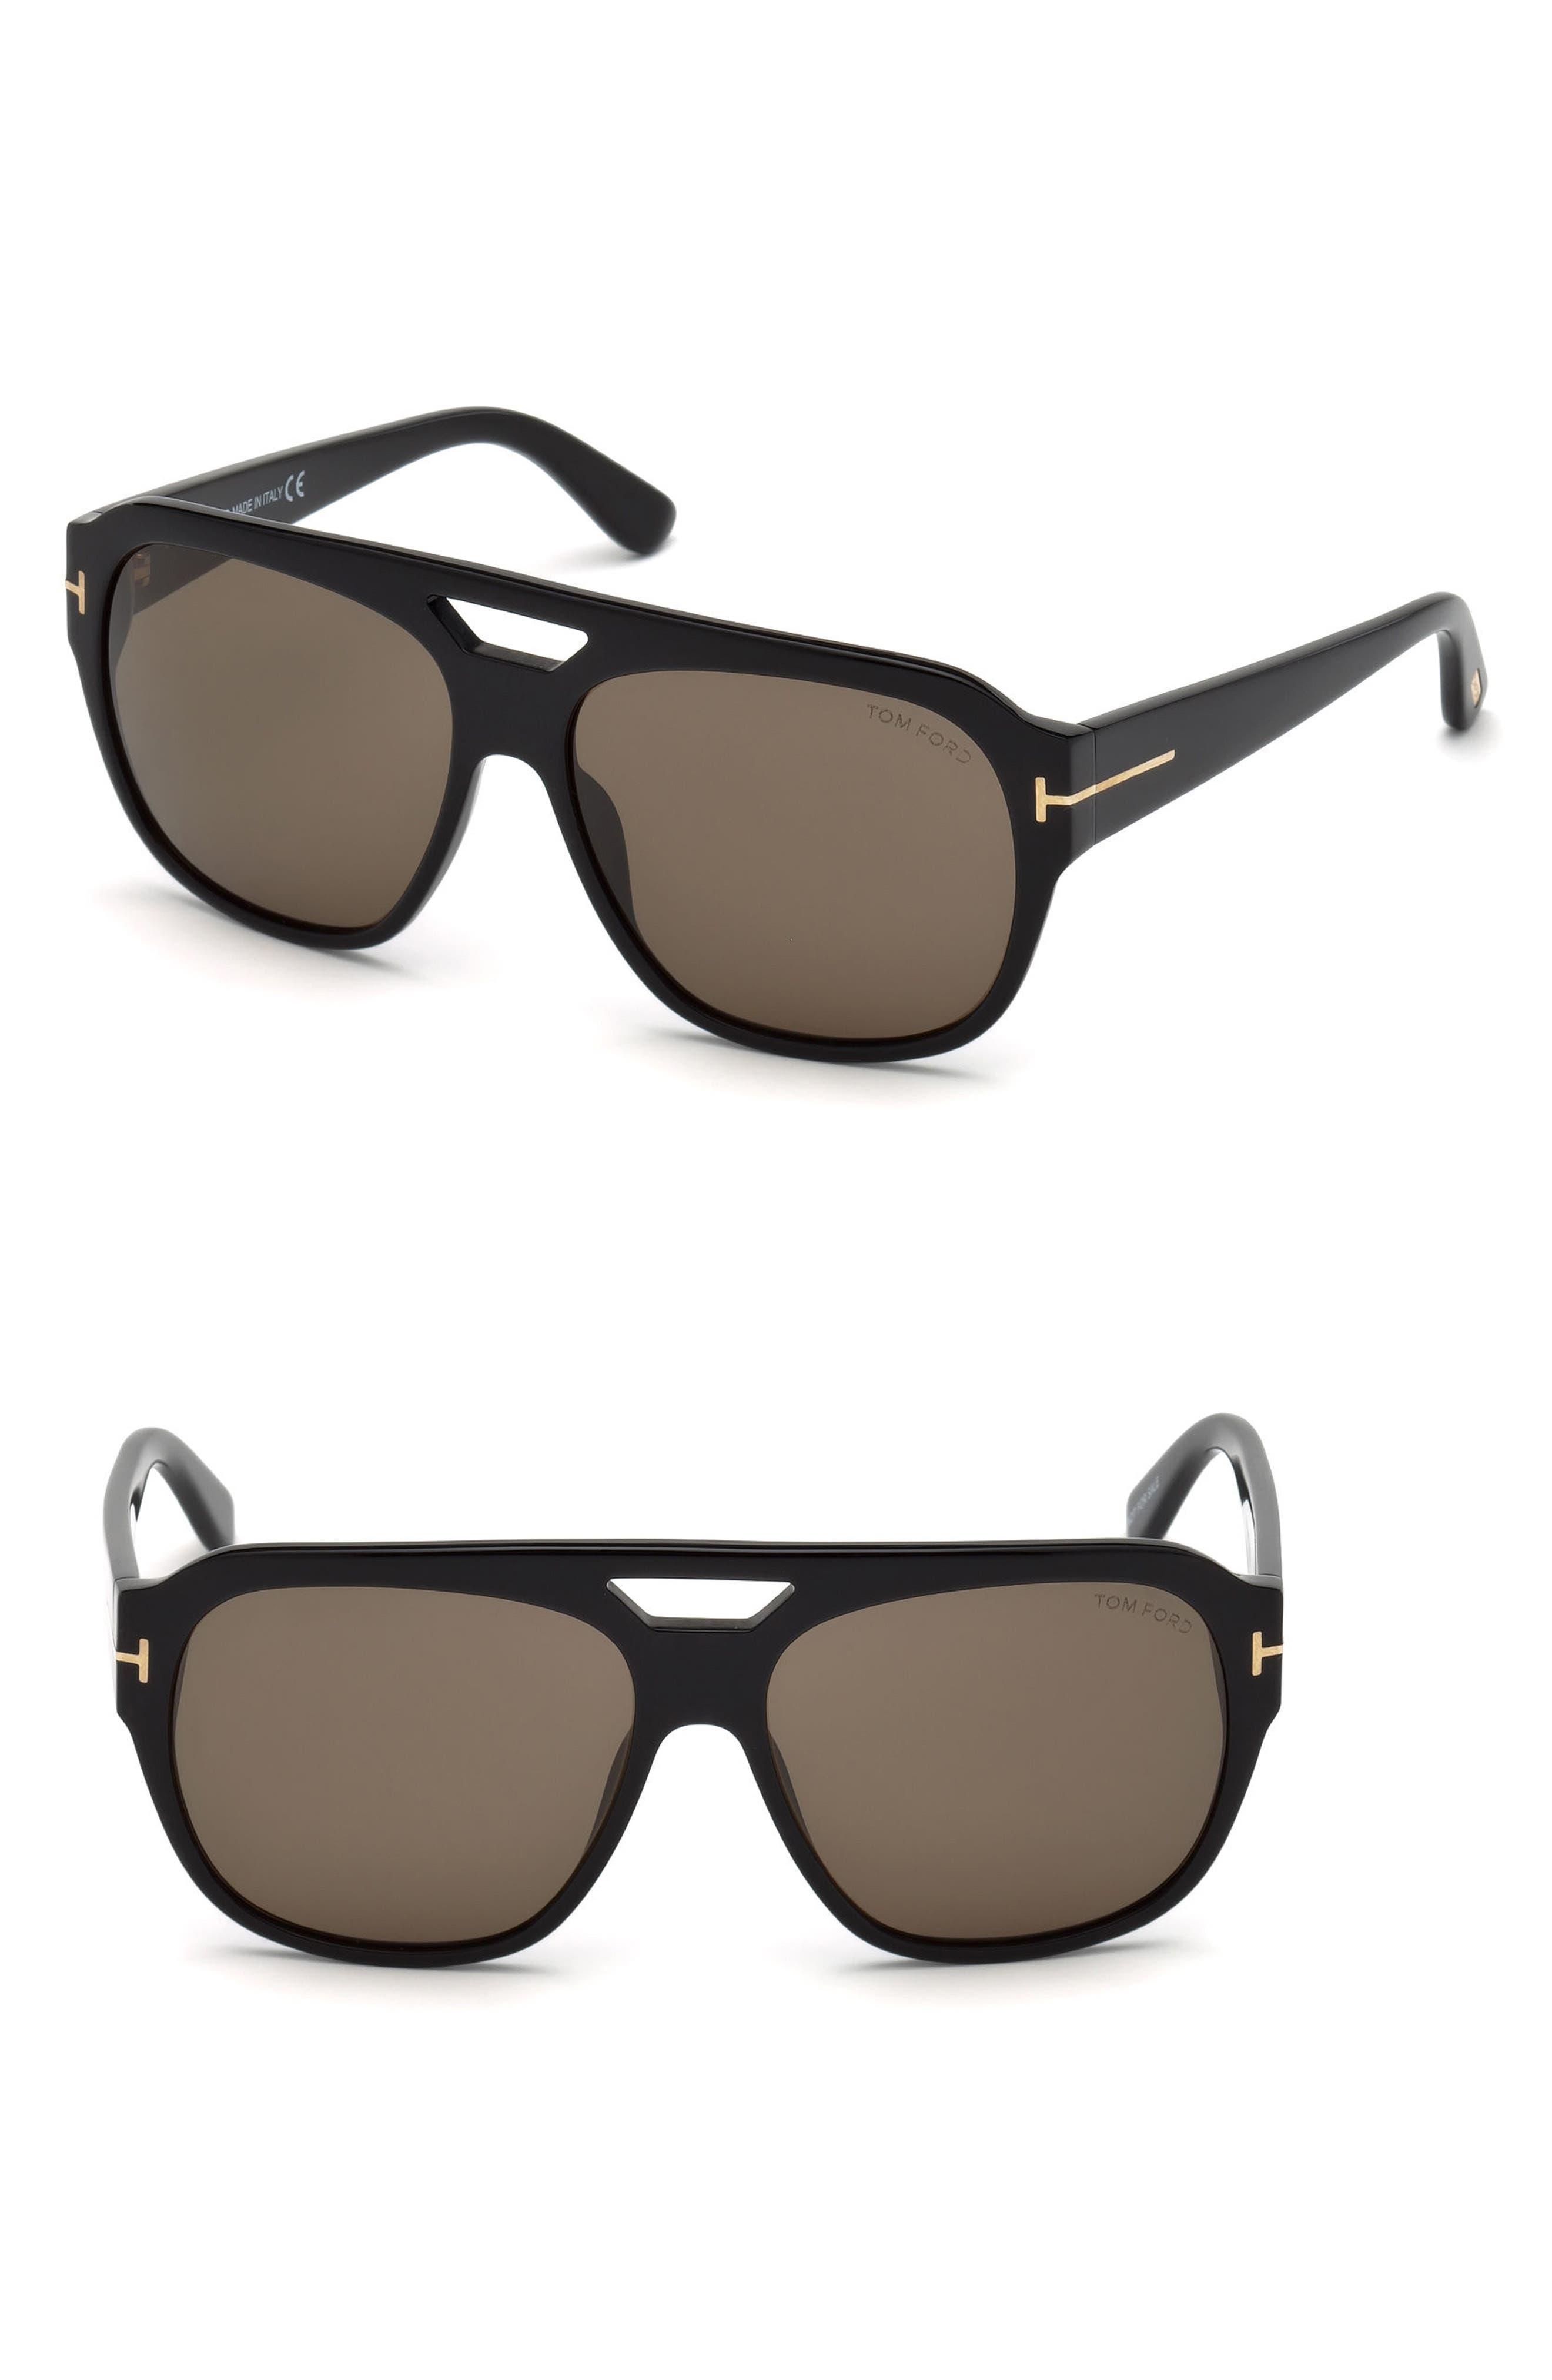 Barchardy 61mm Sunglasses,                             Main thumbnail 1, color,                             SHINY BLACK / ROVIEX